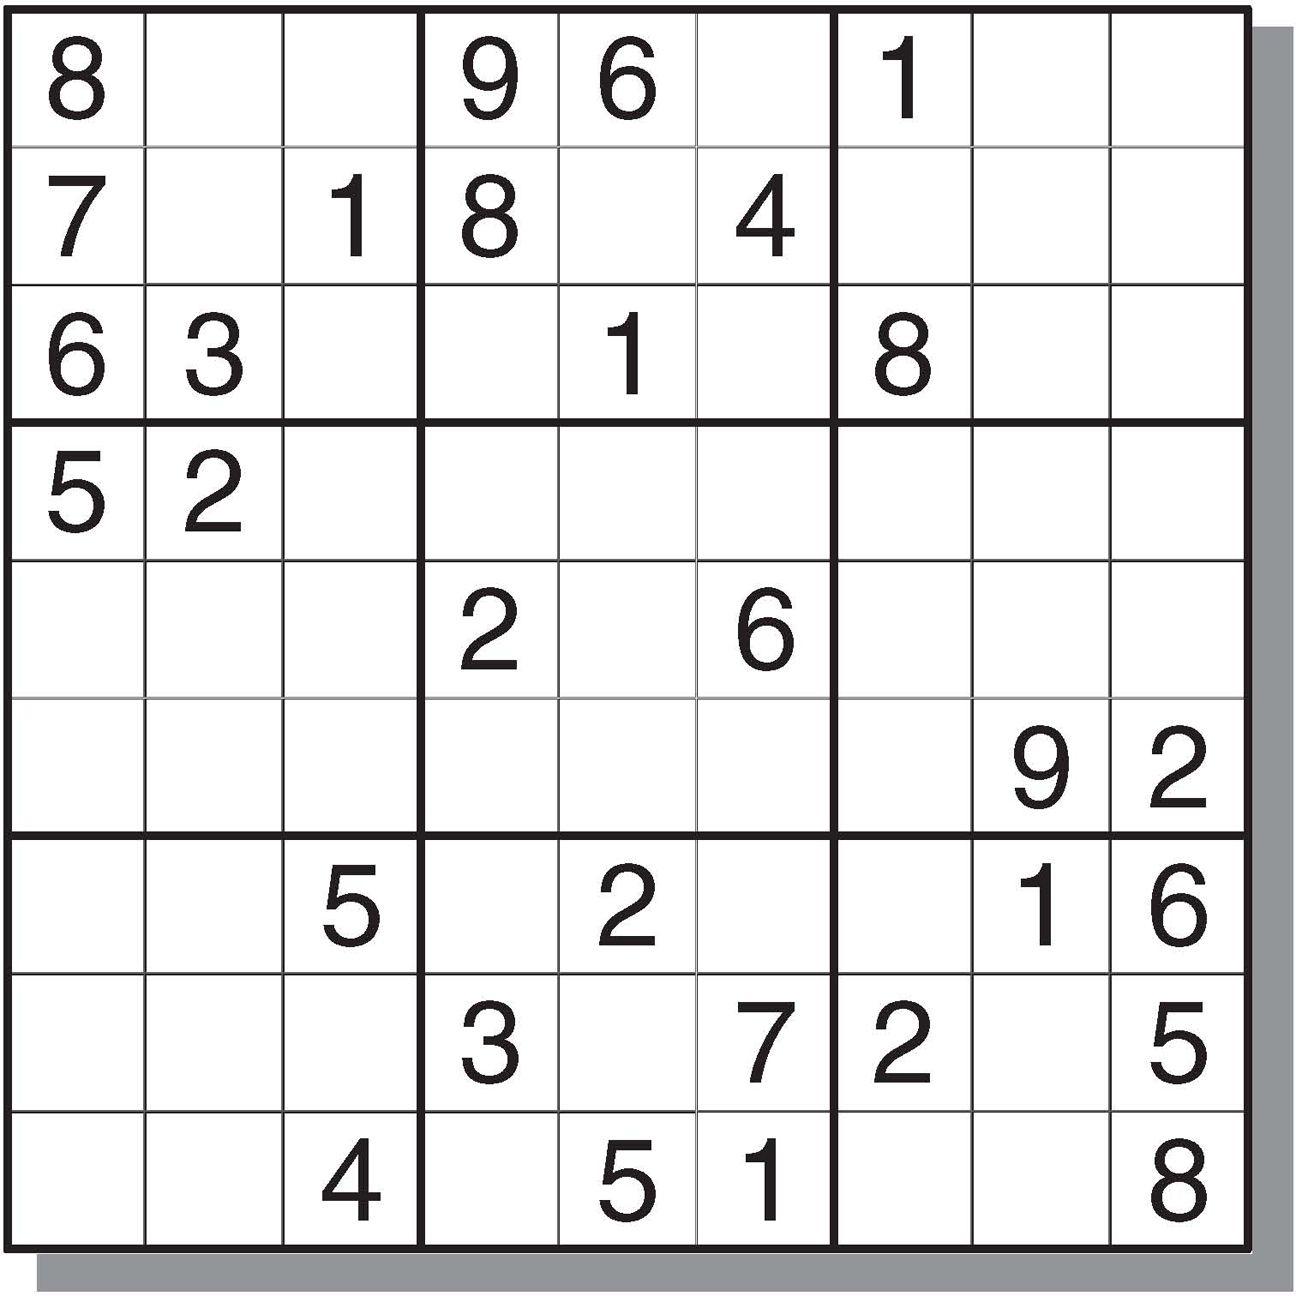 Free&easy Printable Sudoku Puzzles   Sudoku   Sudoku Puzzles, Games - Printable Sudoku Puzzles Krazydad